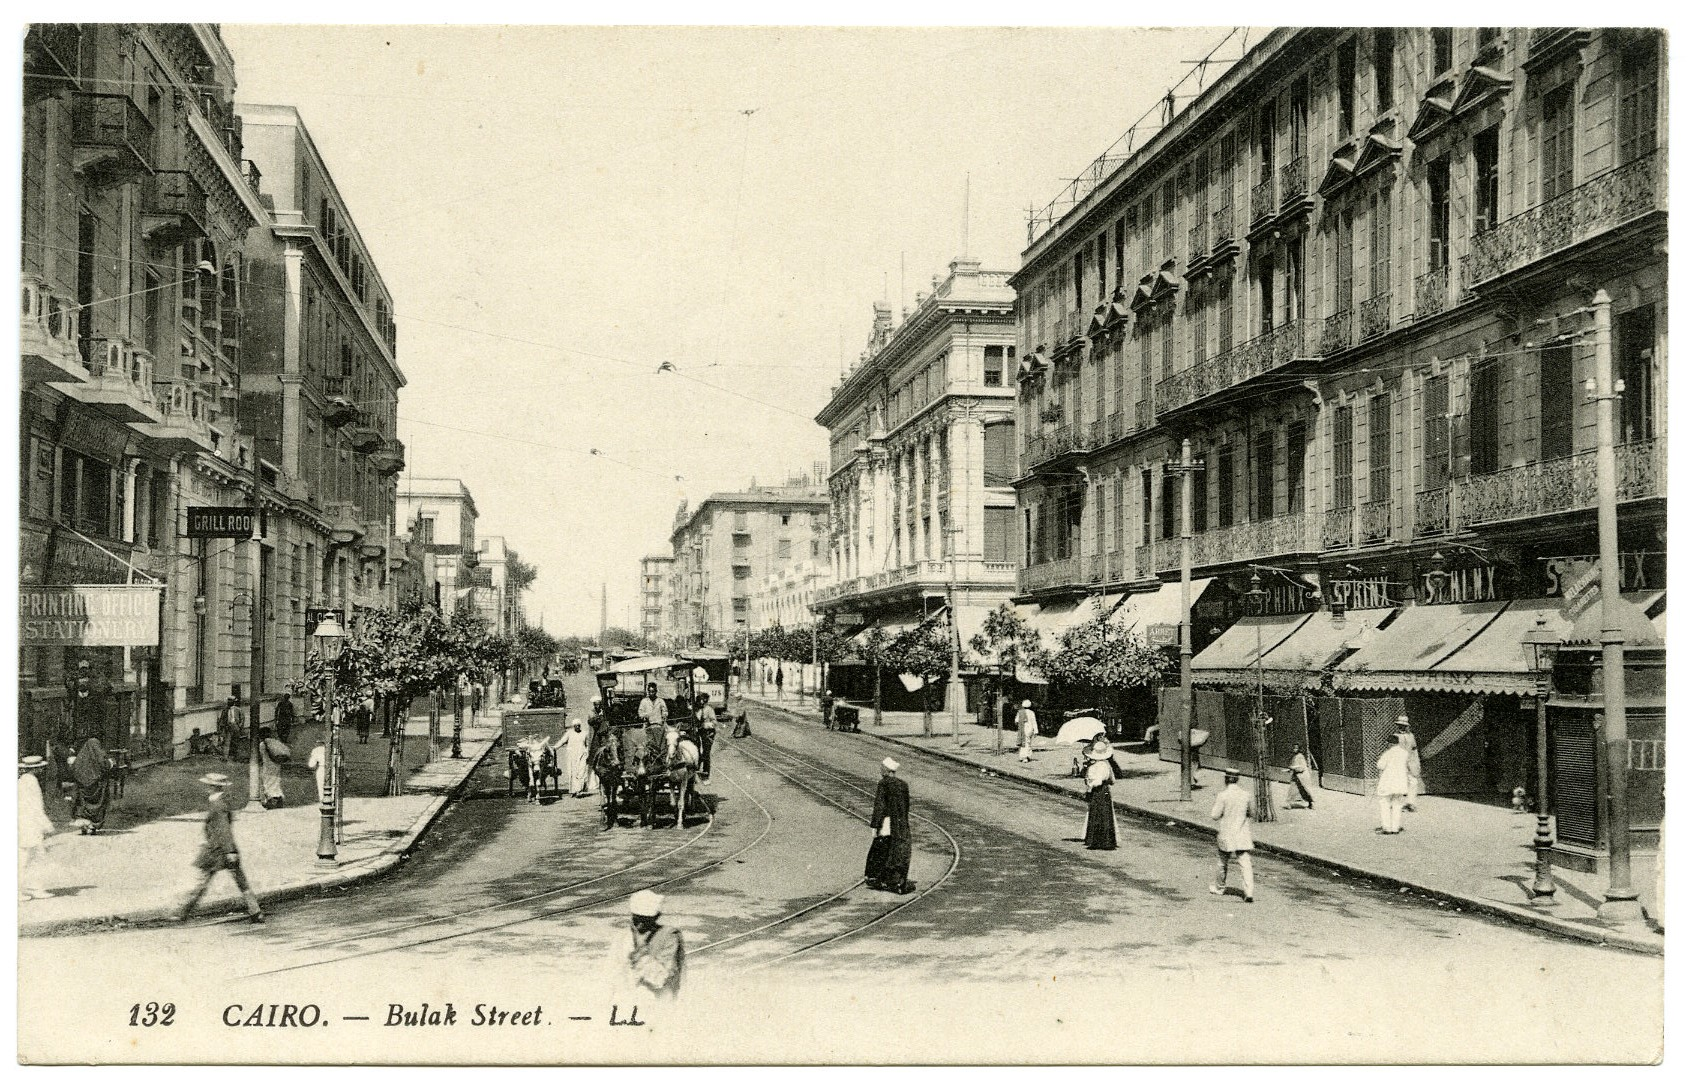 Postcard #6